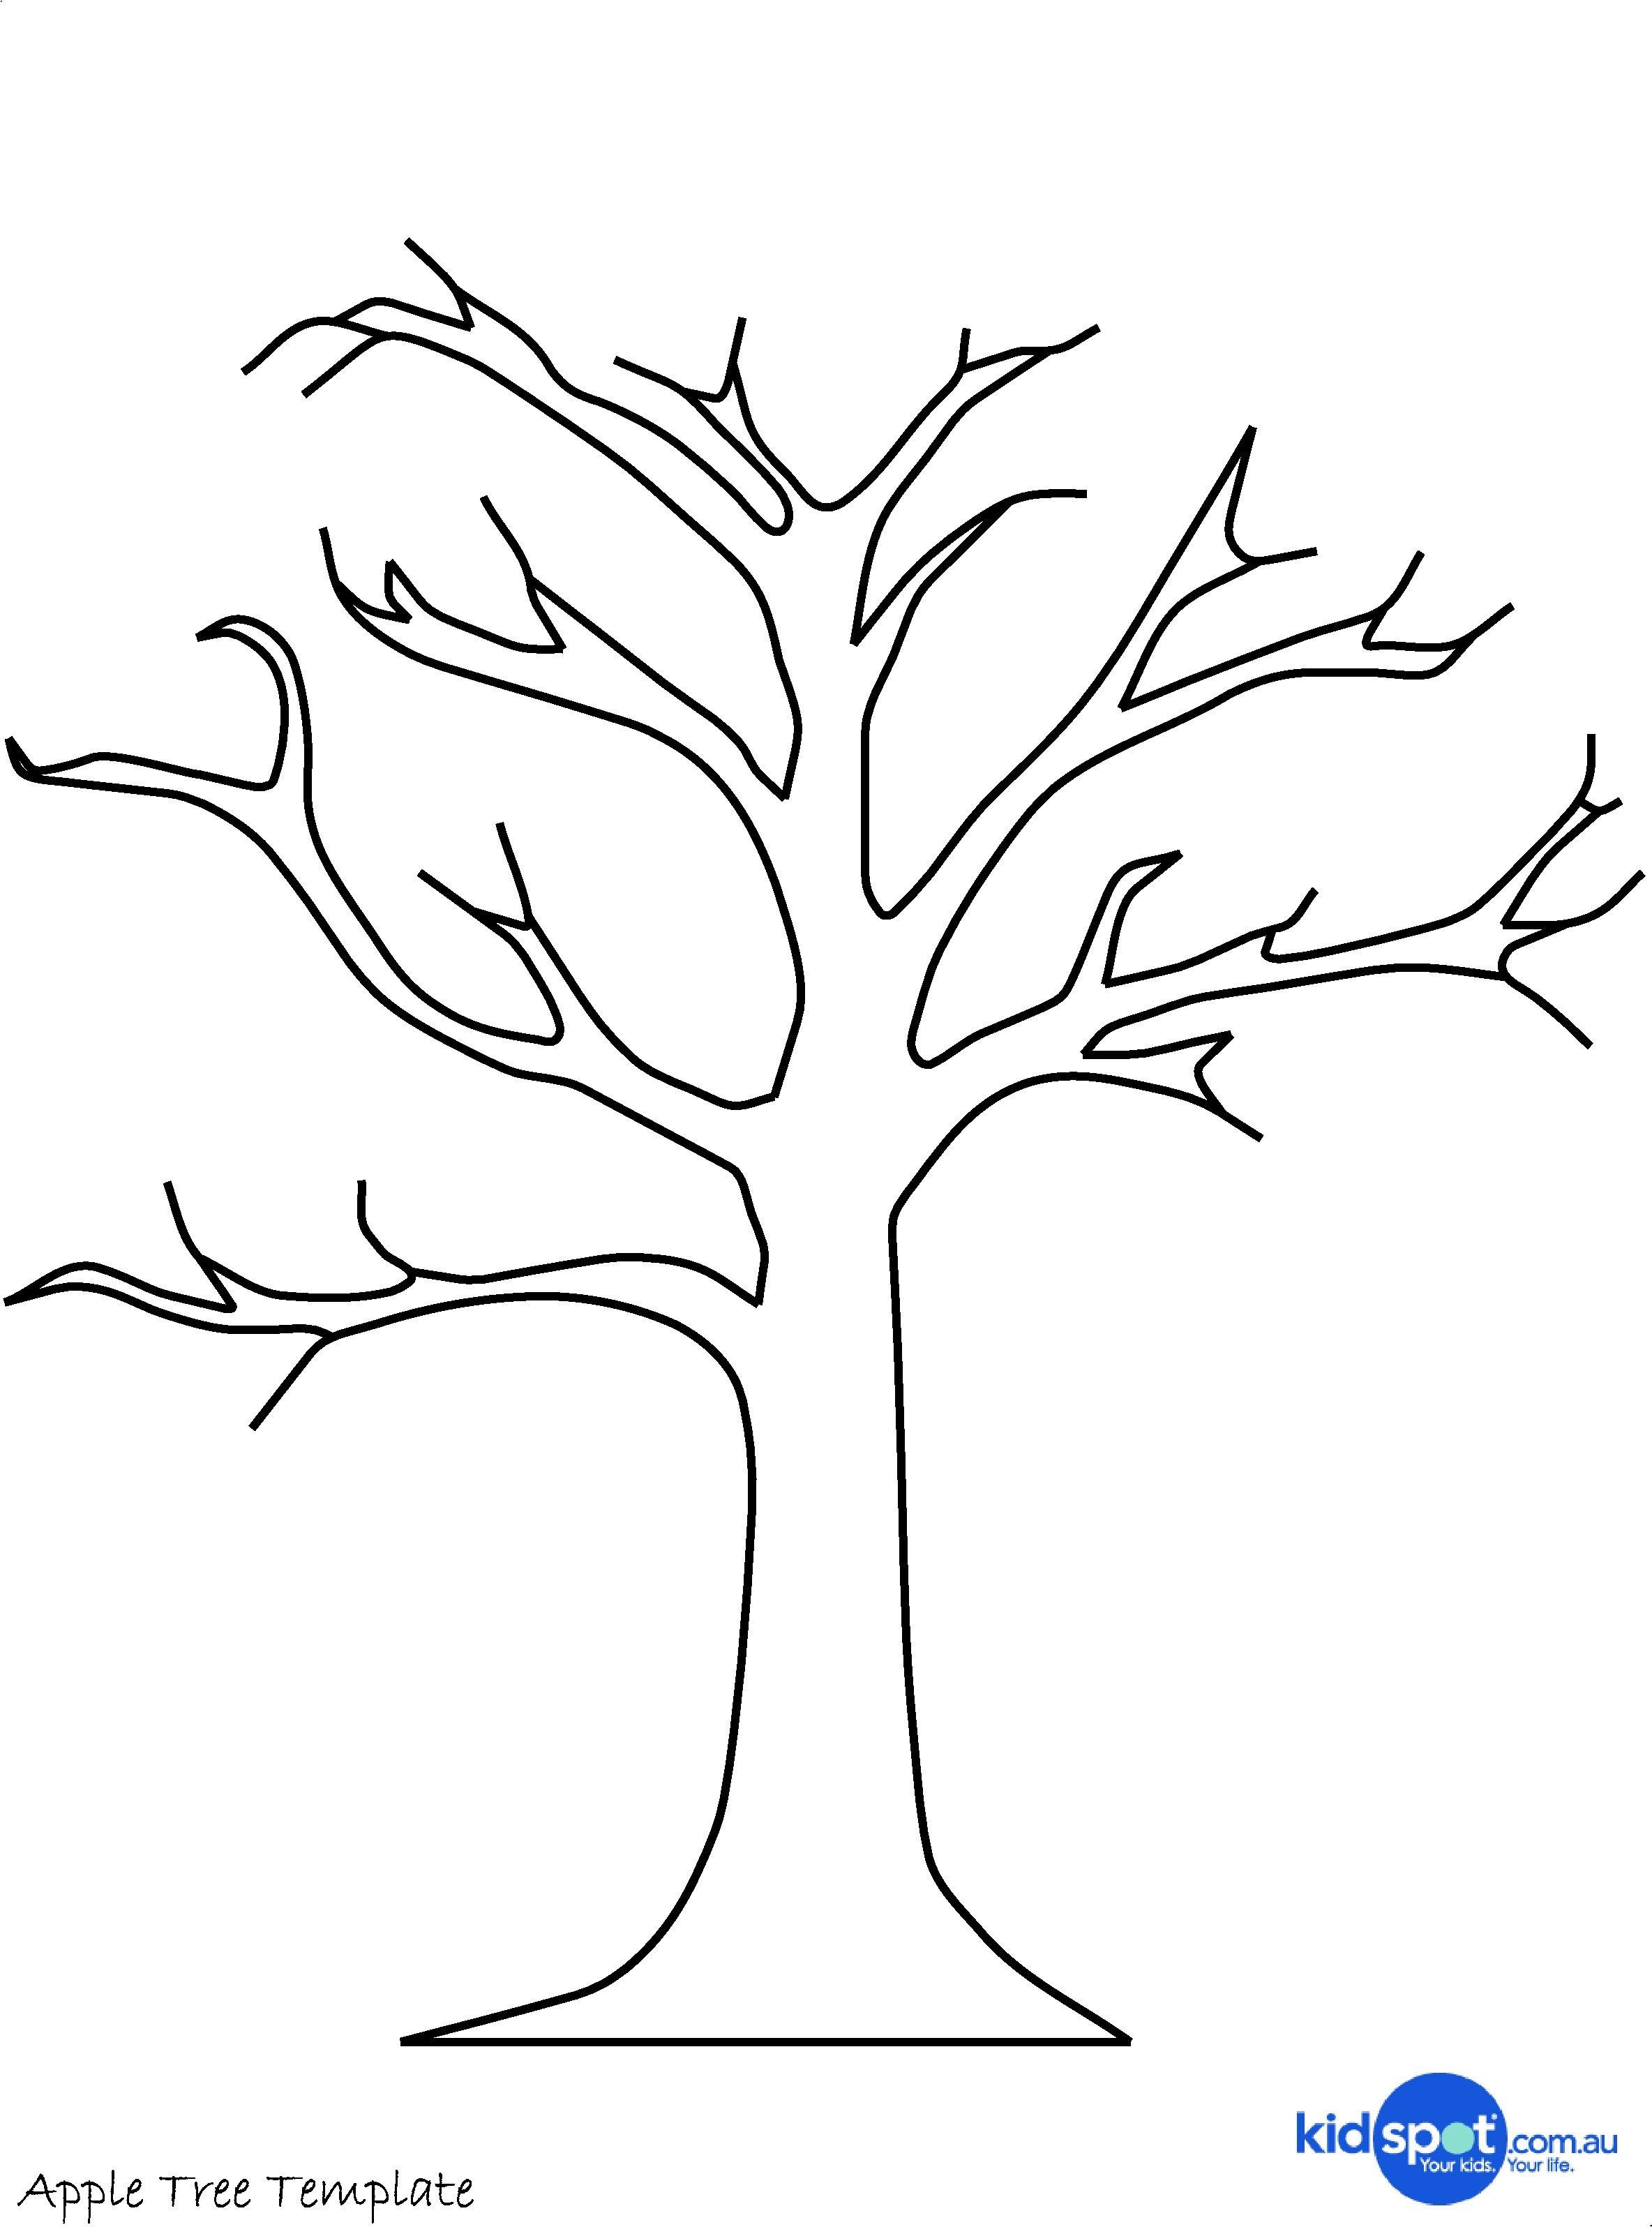 Printable Tree Template   Tree Craft - Cork Stamp Apple Tree - Art - Free Printable Tree Template